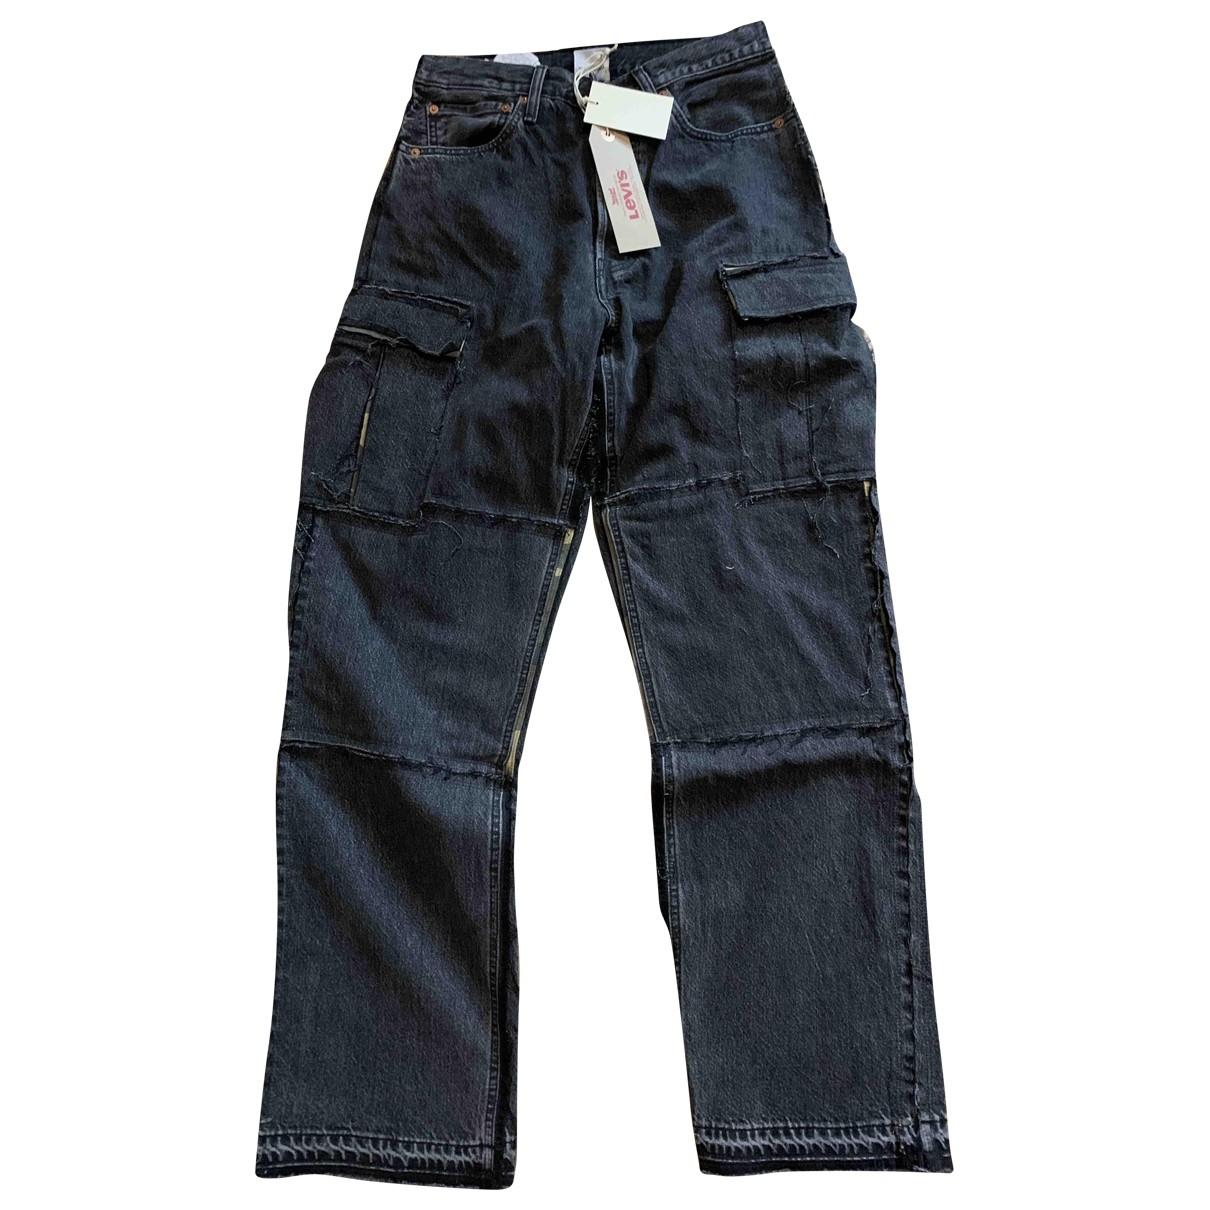 Vetements X Levi's \N Black Denim - Jeans Jeans for Women 38 FR